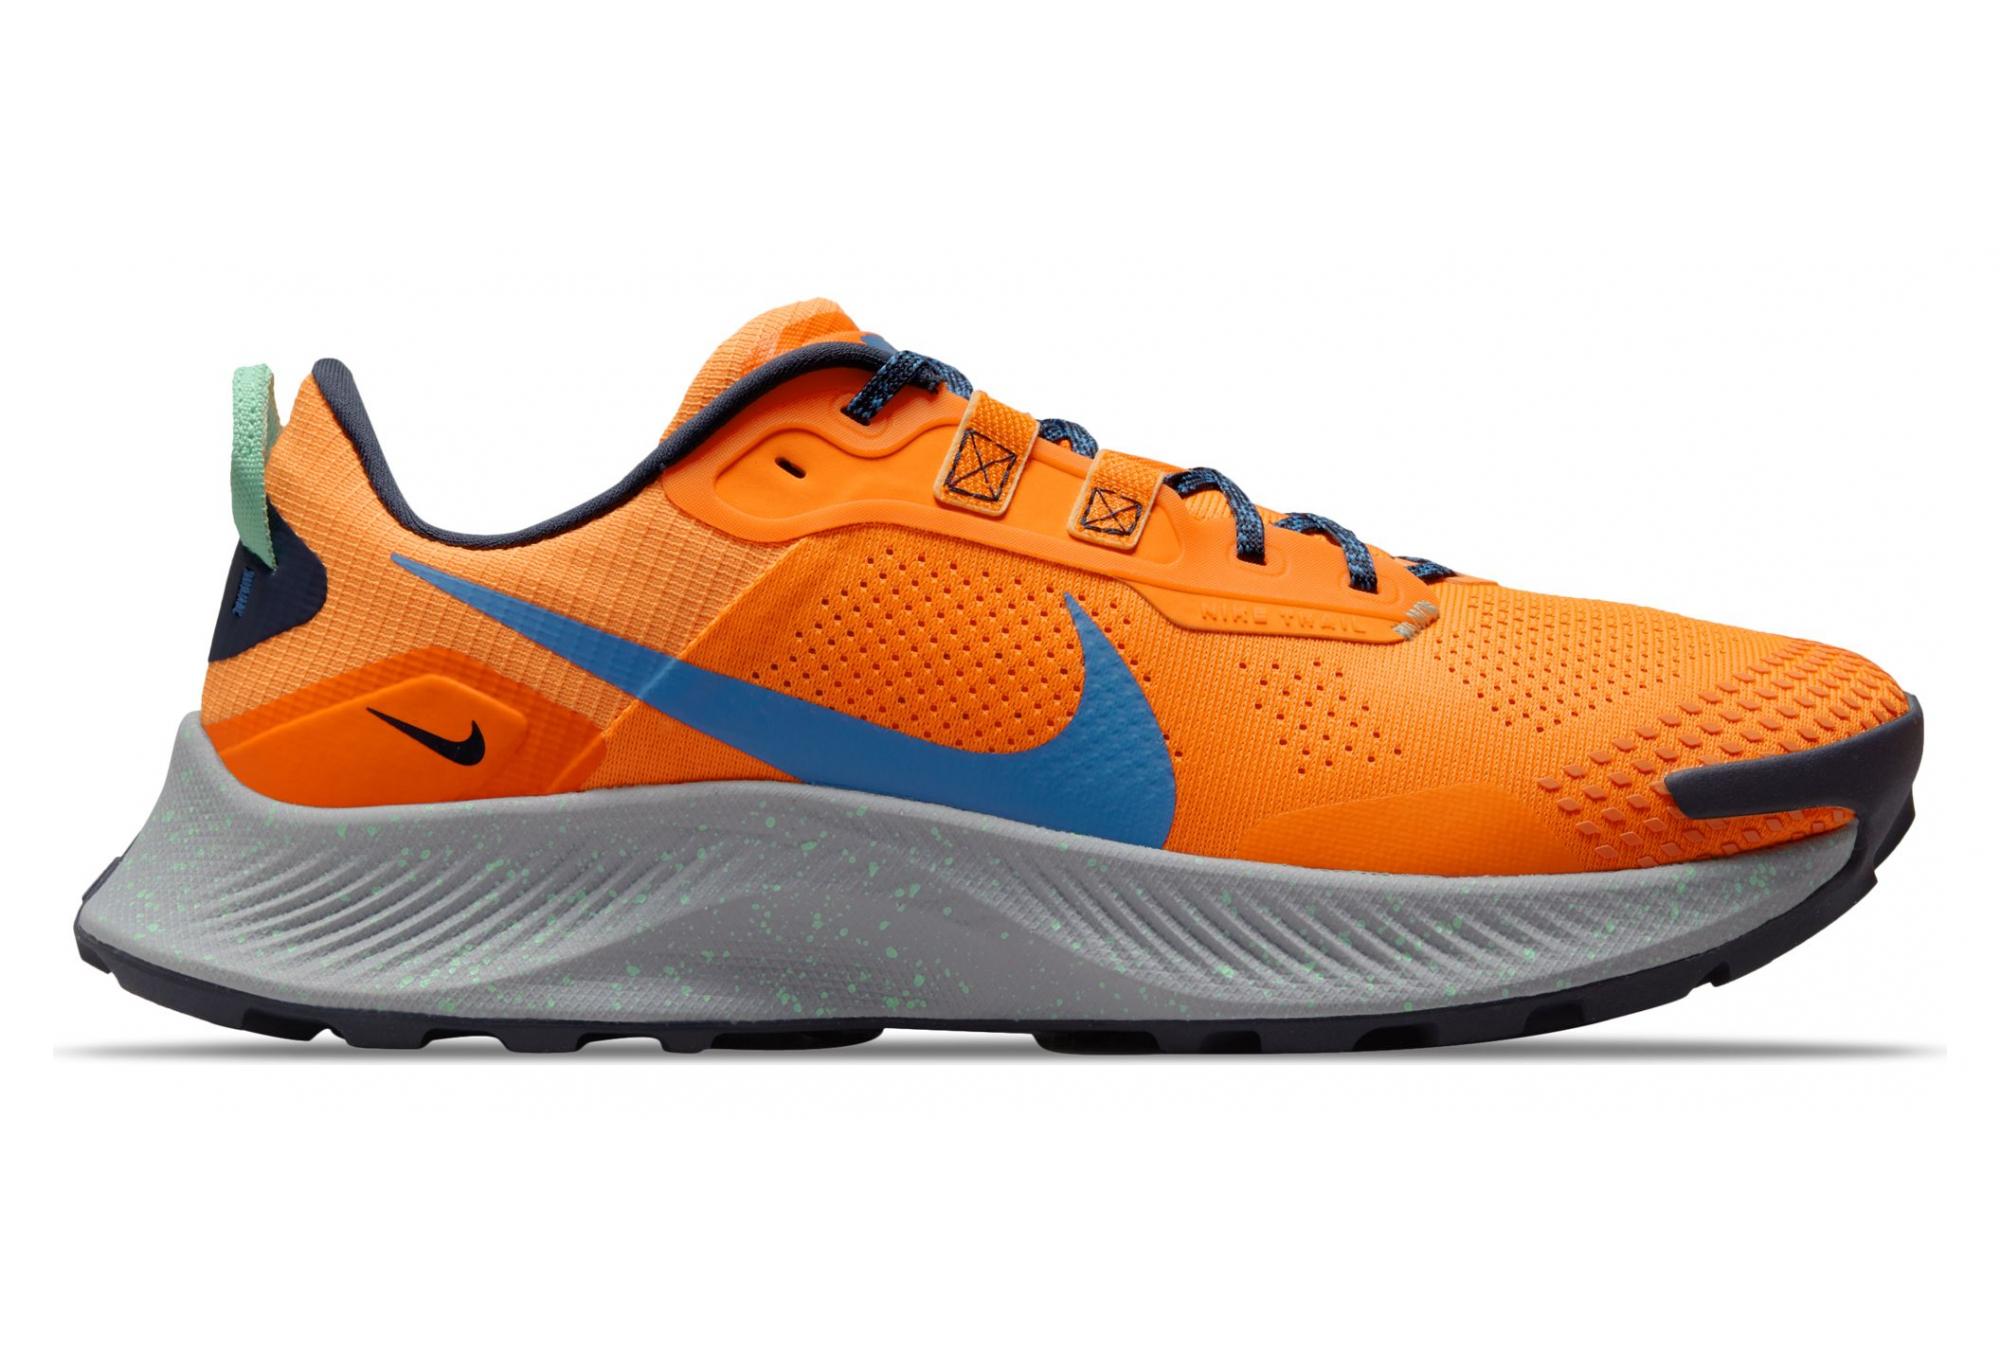 Nike Pegasus Trail 3 Trail Running Shoes Orange/Blue